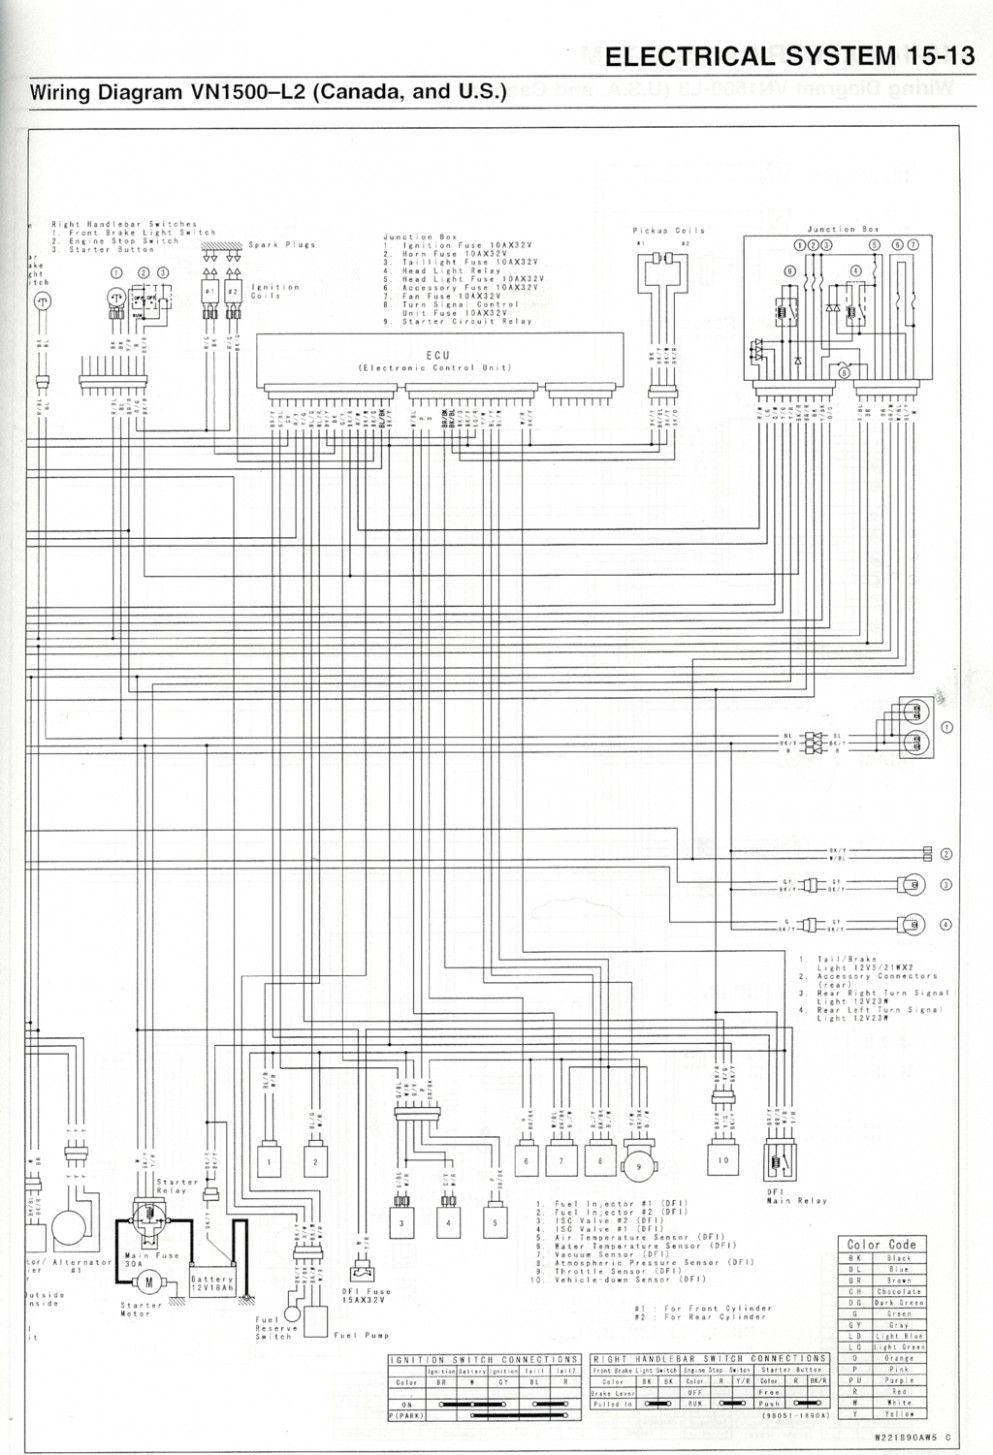 [DIAGRAM] Boeing 777 Wiring Diagram Manual